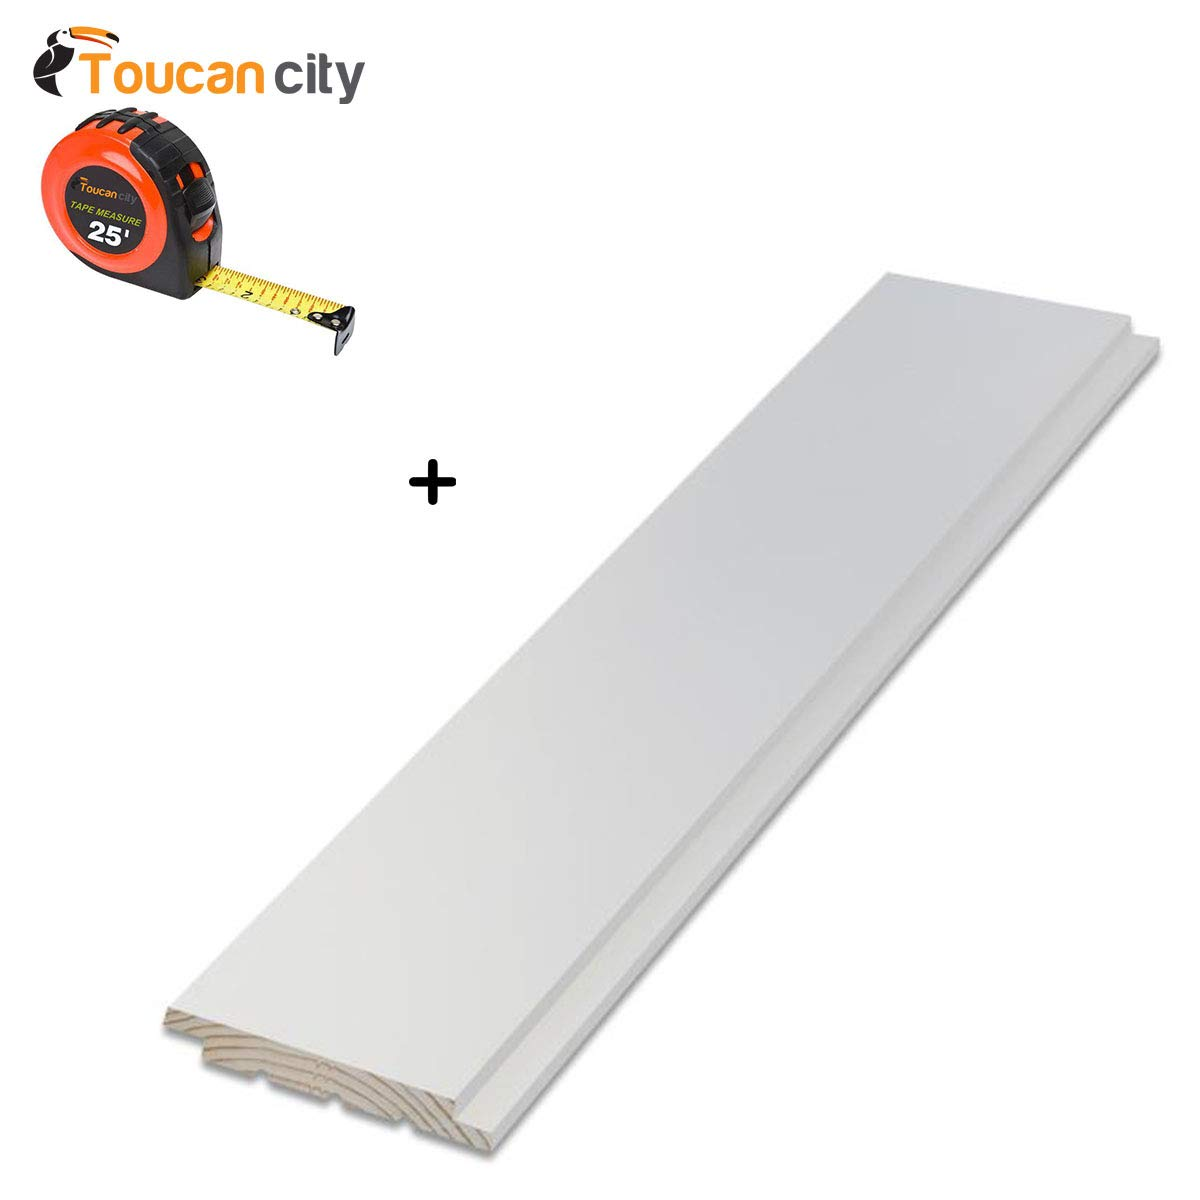 Toucan CityテープメジャーとArauco 9 / 16 in。x 5 – 1 / 4インチx 8 ft。Primed Pineニッケルギャップ出荷Lapボード(6個入りperボックス) 28994 B07G71986X